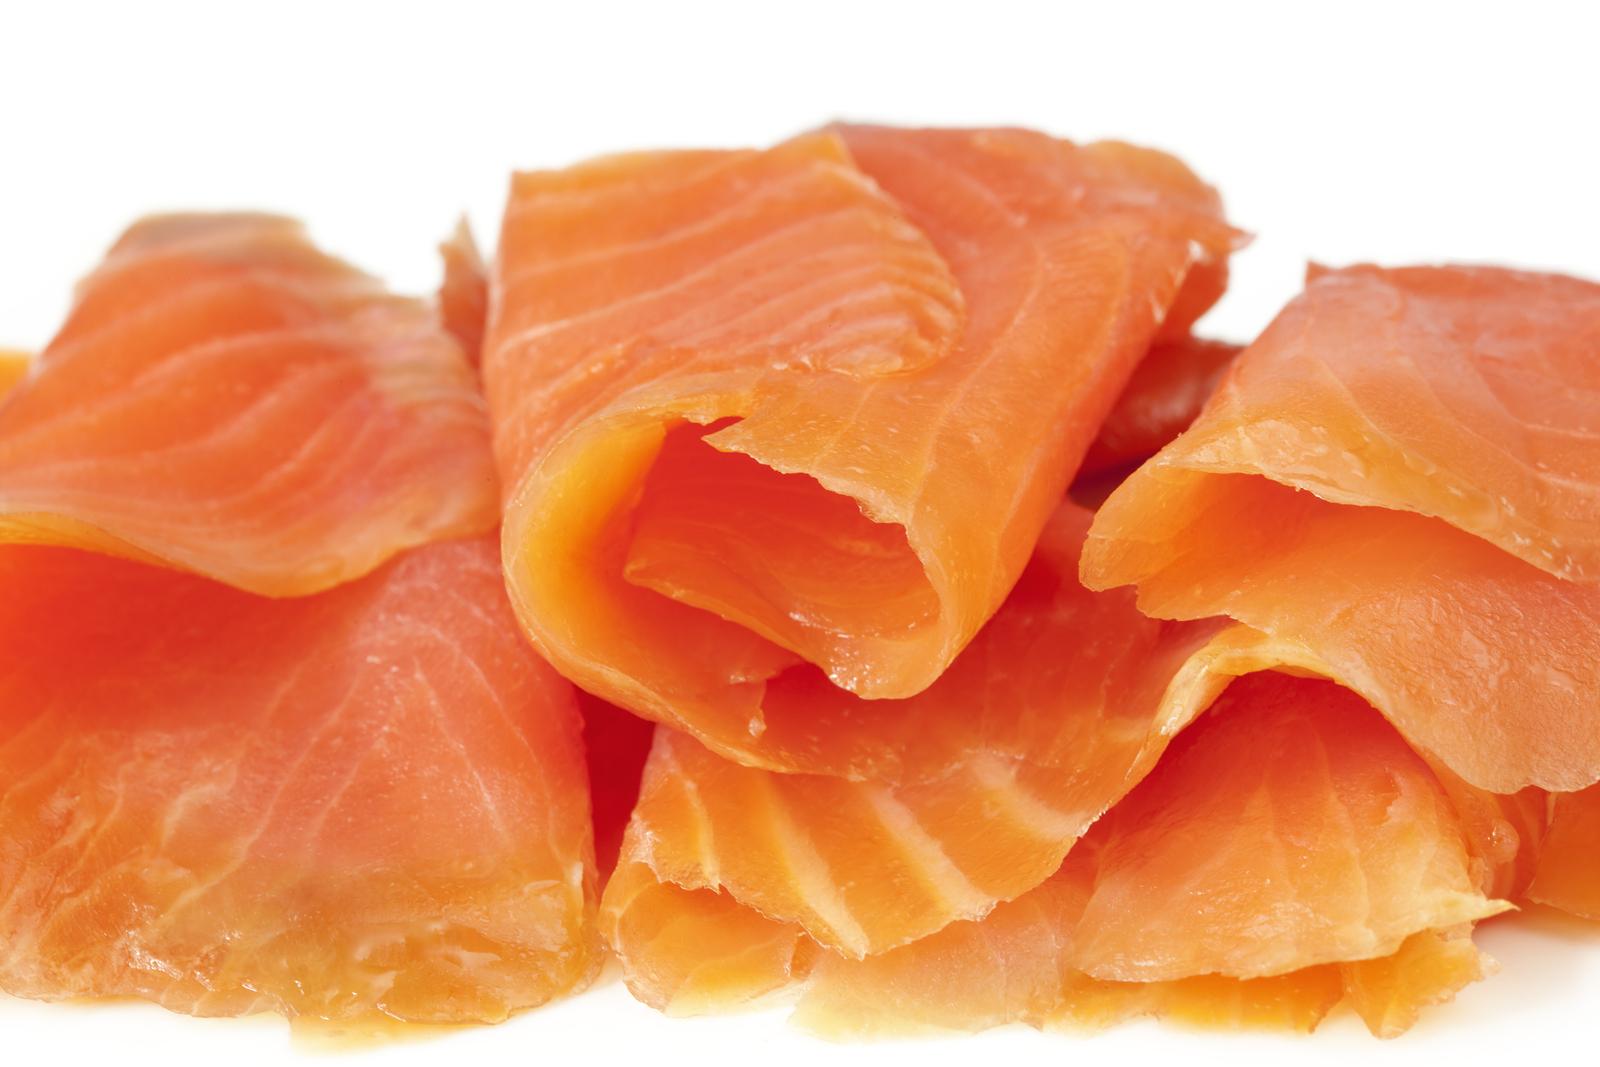 Smoked Salmon Recalled Supermarket News